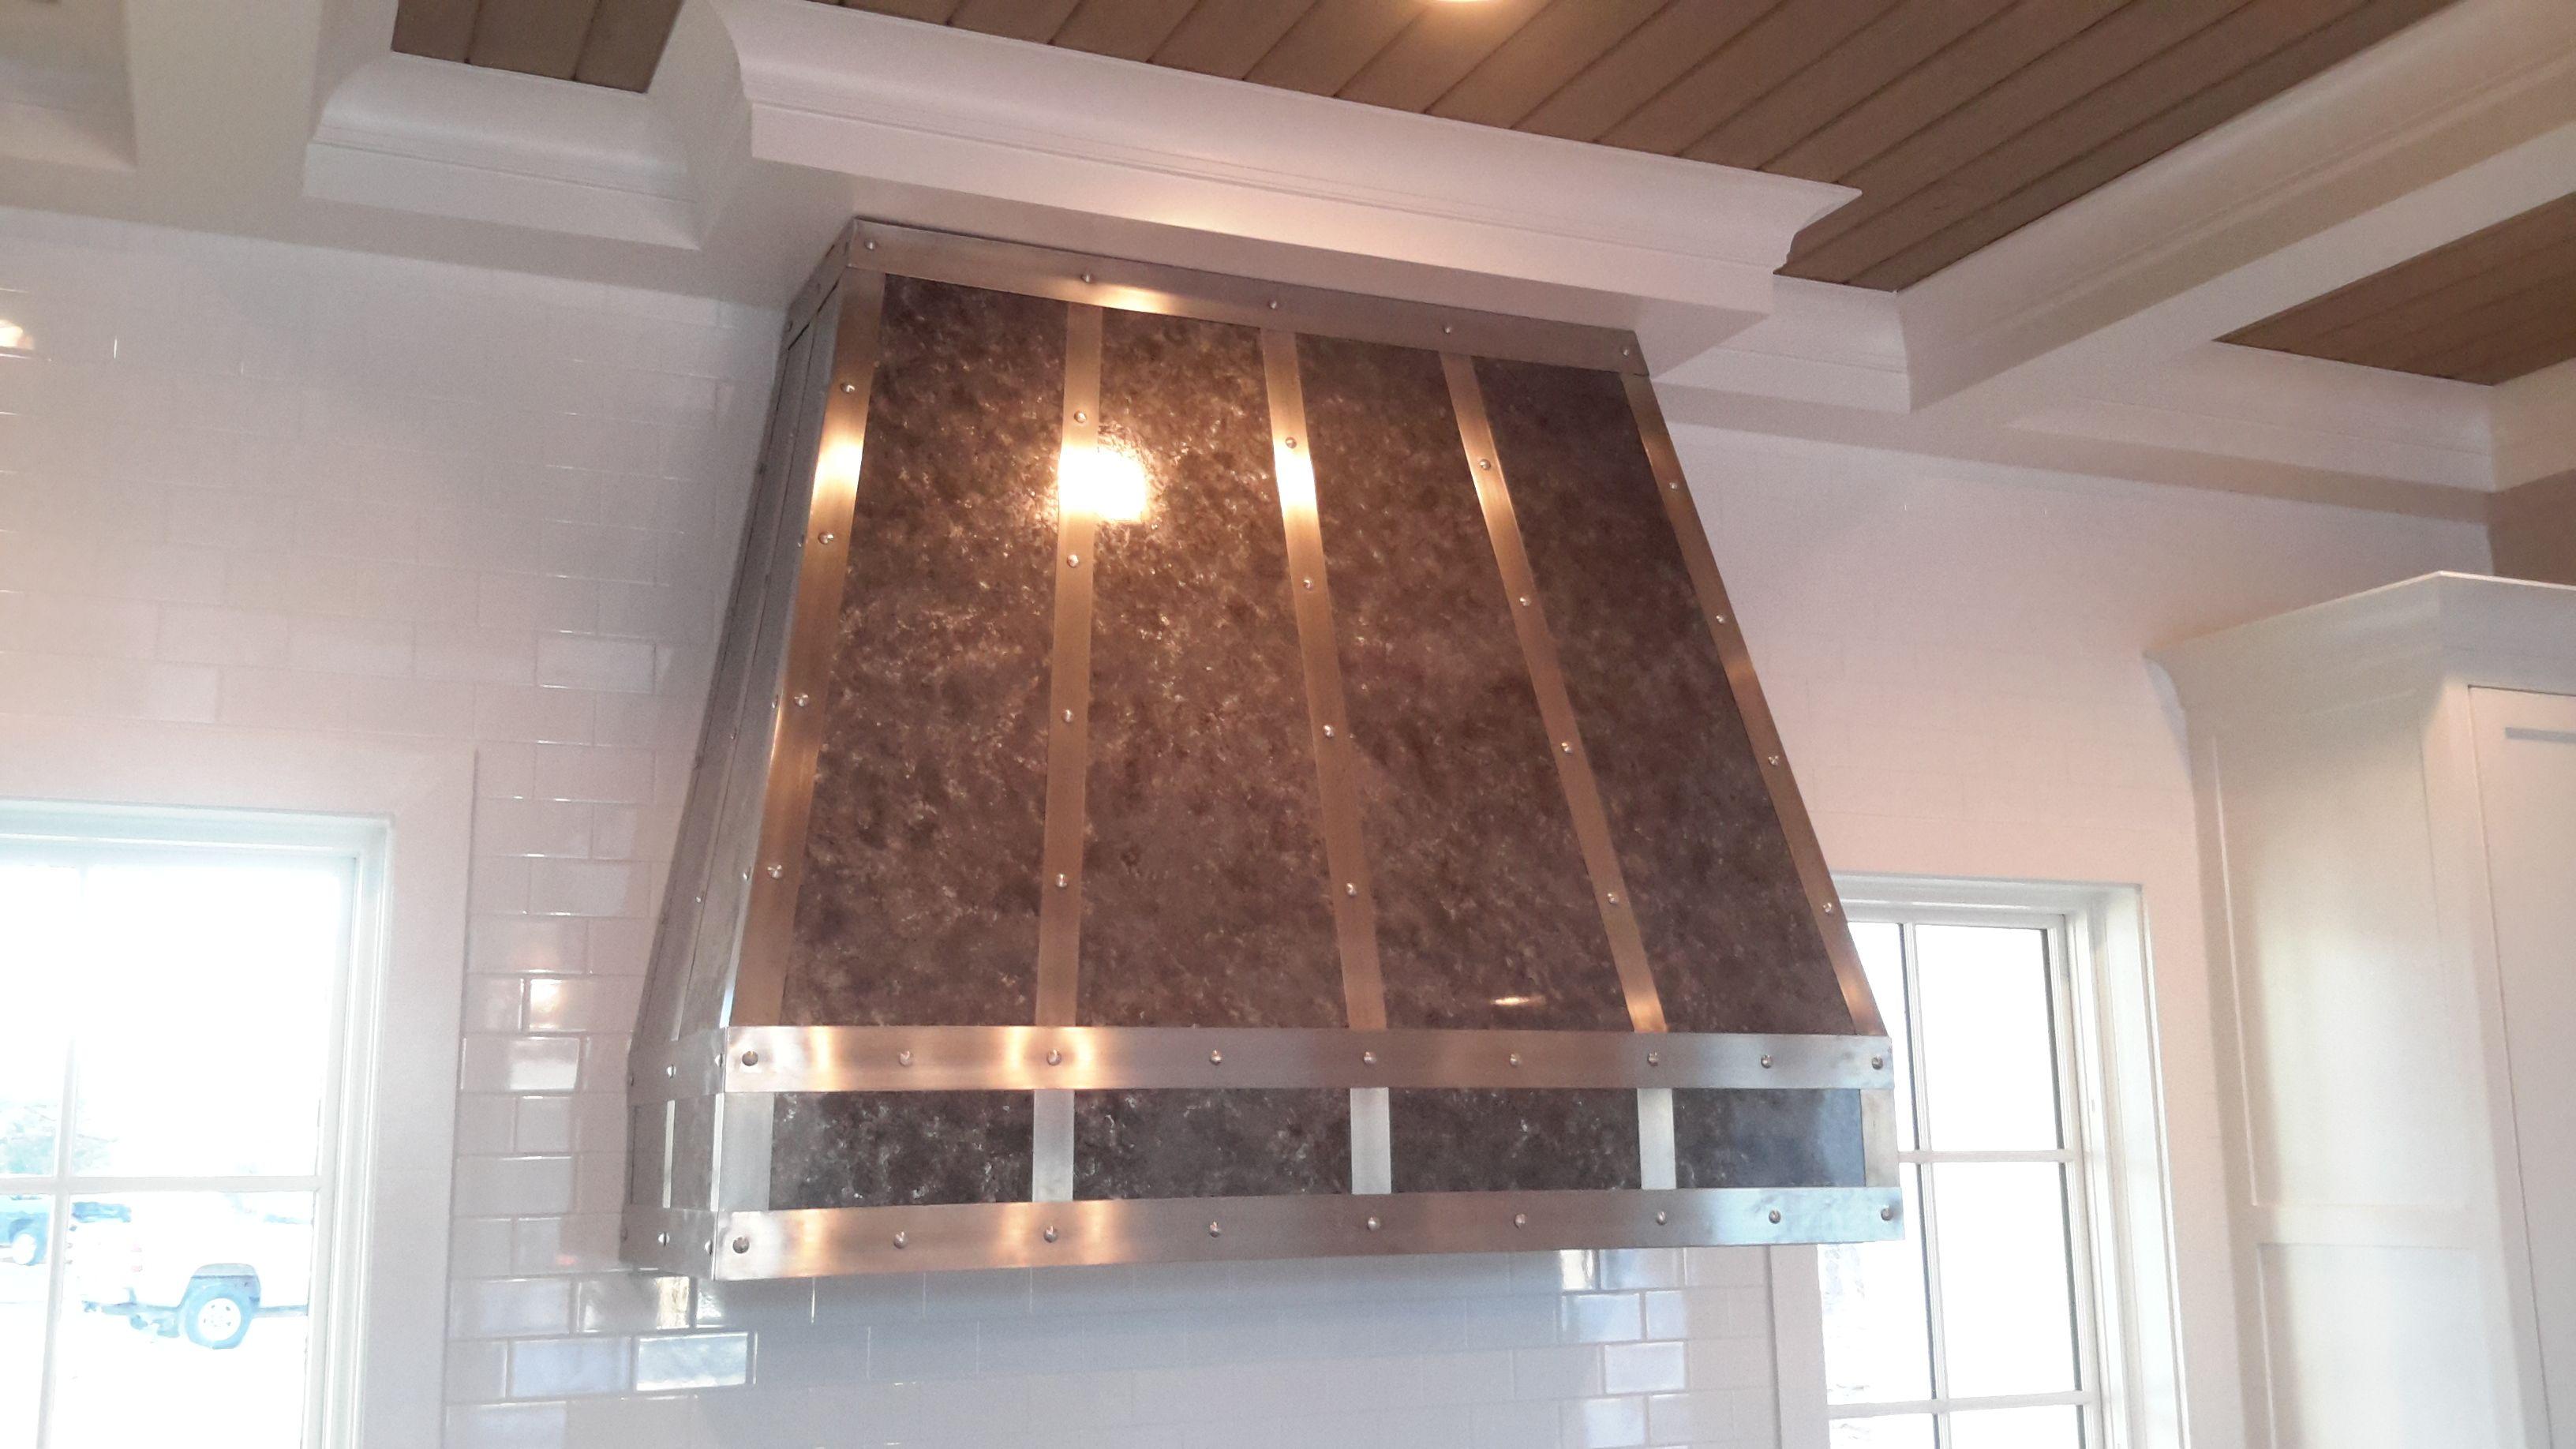 Custom Made The Herlitz Zinc And Stainless Steel Kitchen Range Hood